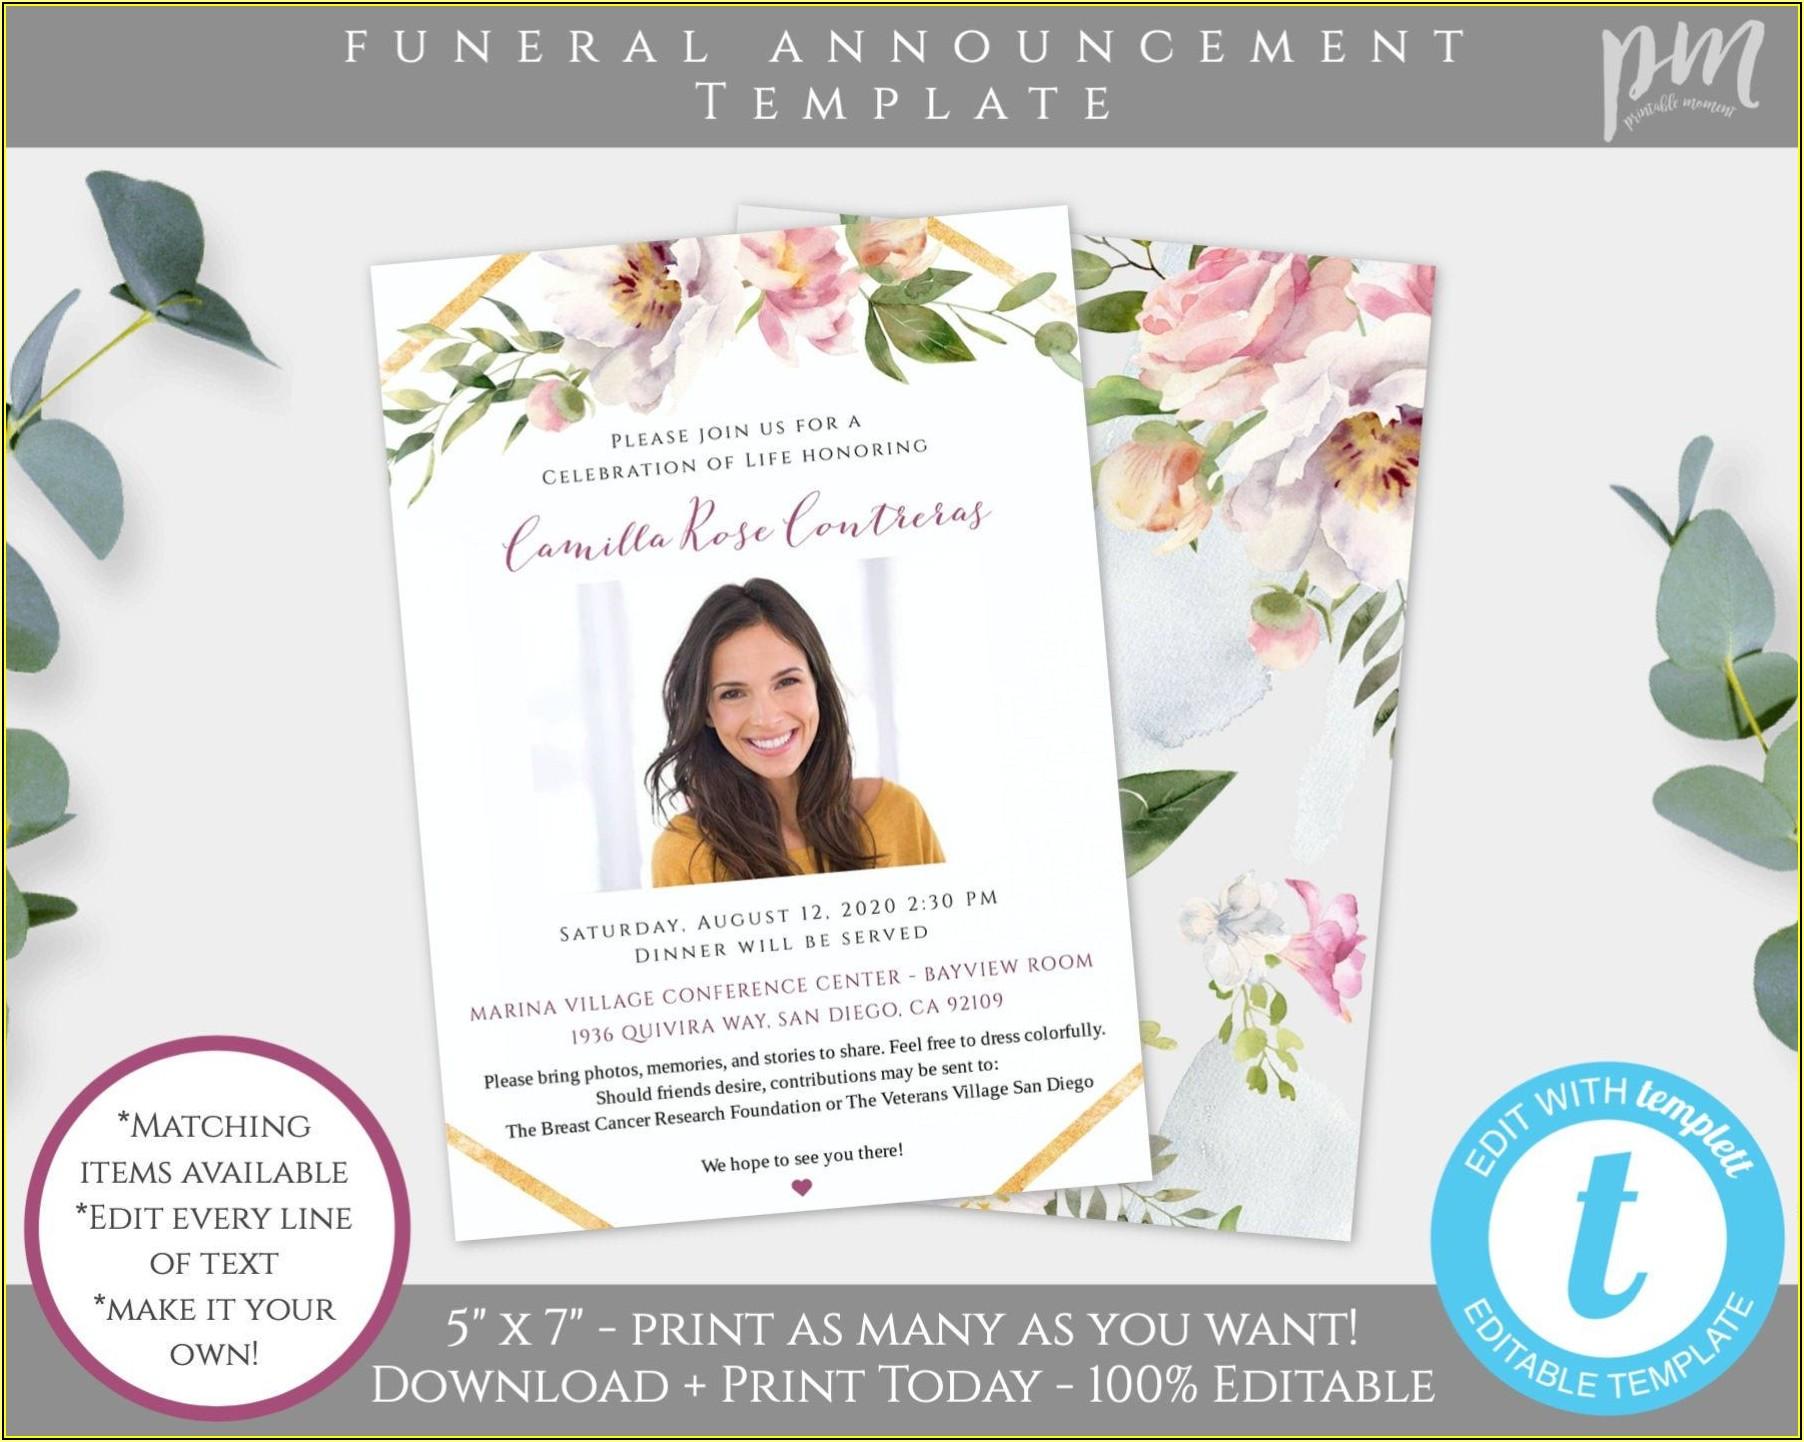 Memorial Service Announcement Template